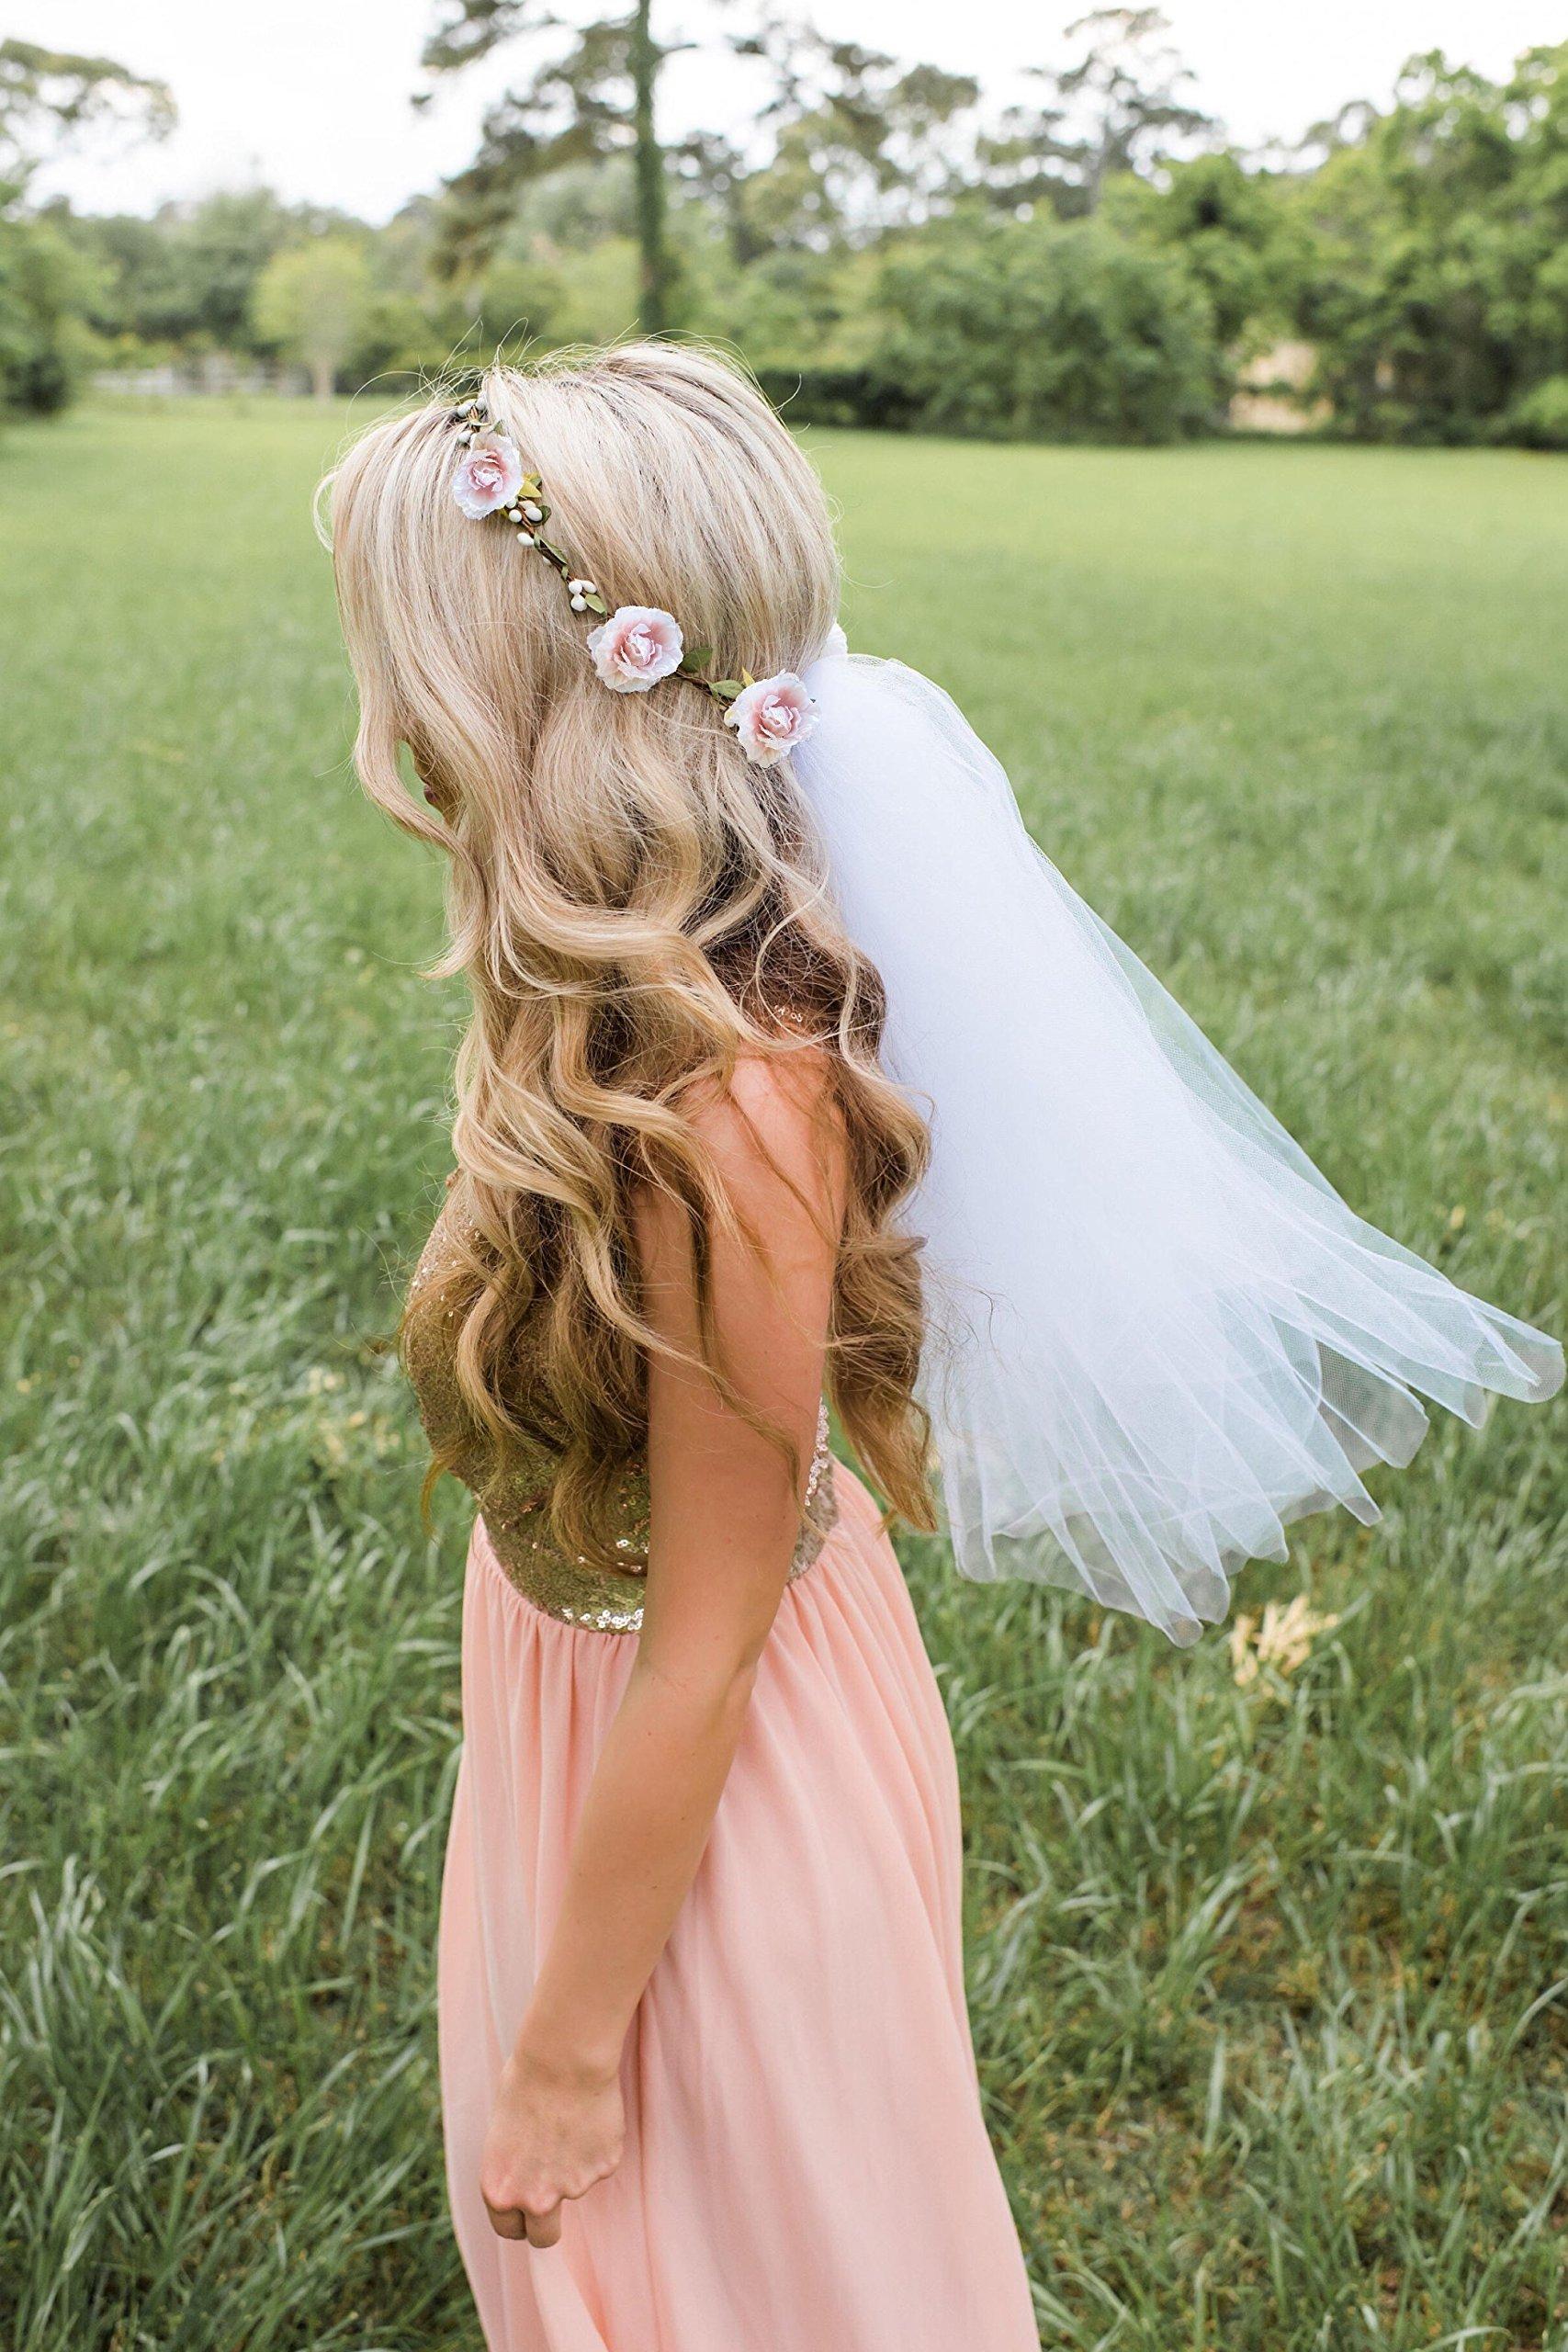 Flower Crown Veil - Bachelorette Veil - Champagne Pink Flowers (NEW)